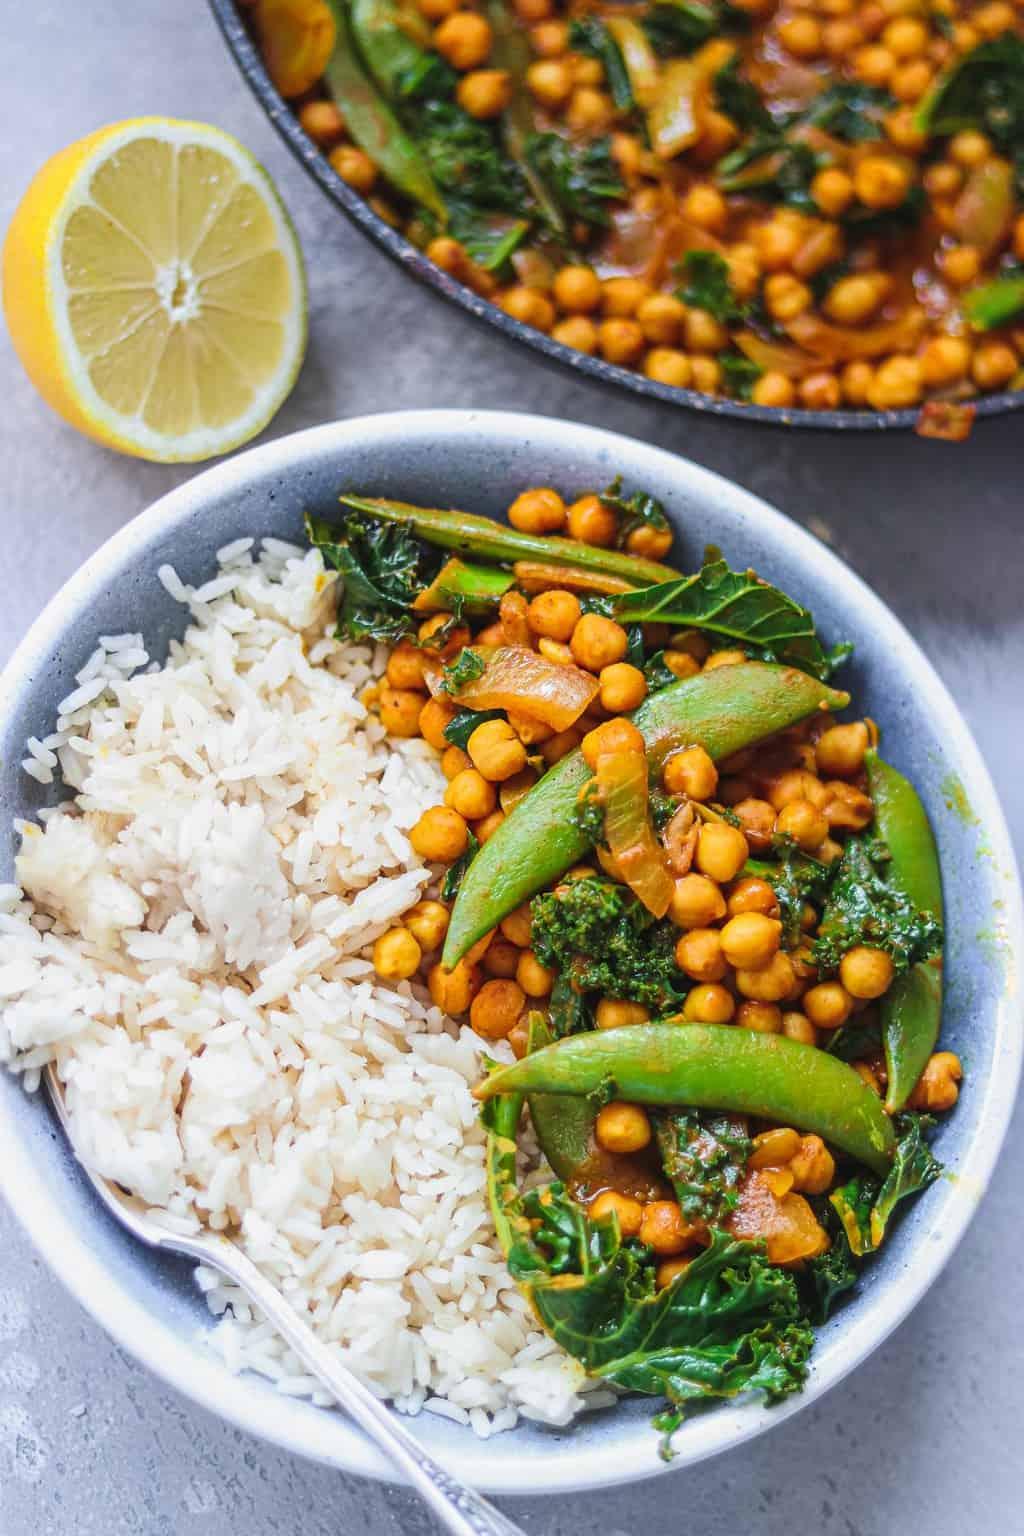 Vegan peanut chickpea curry gluten-free oil-free